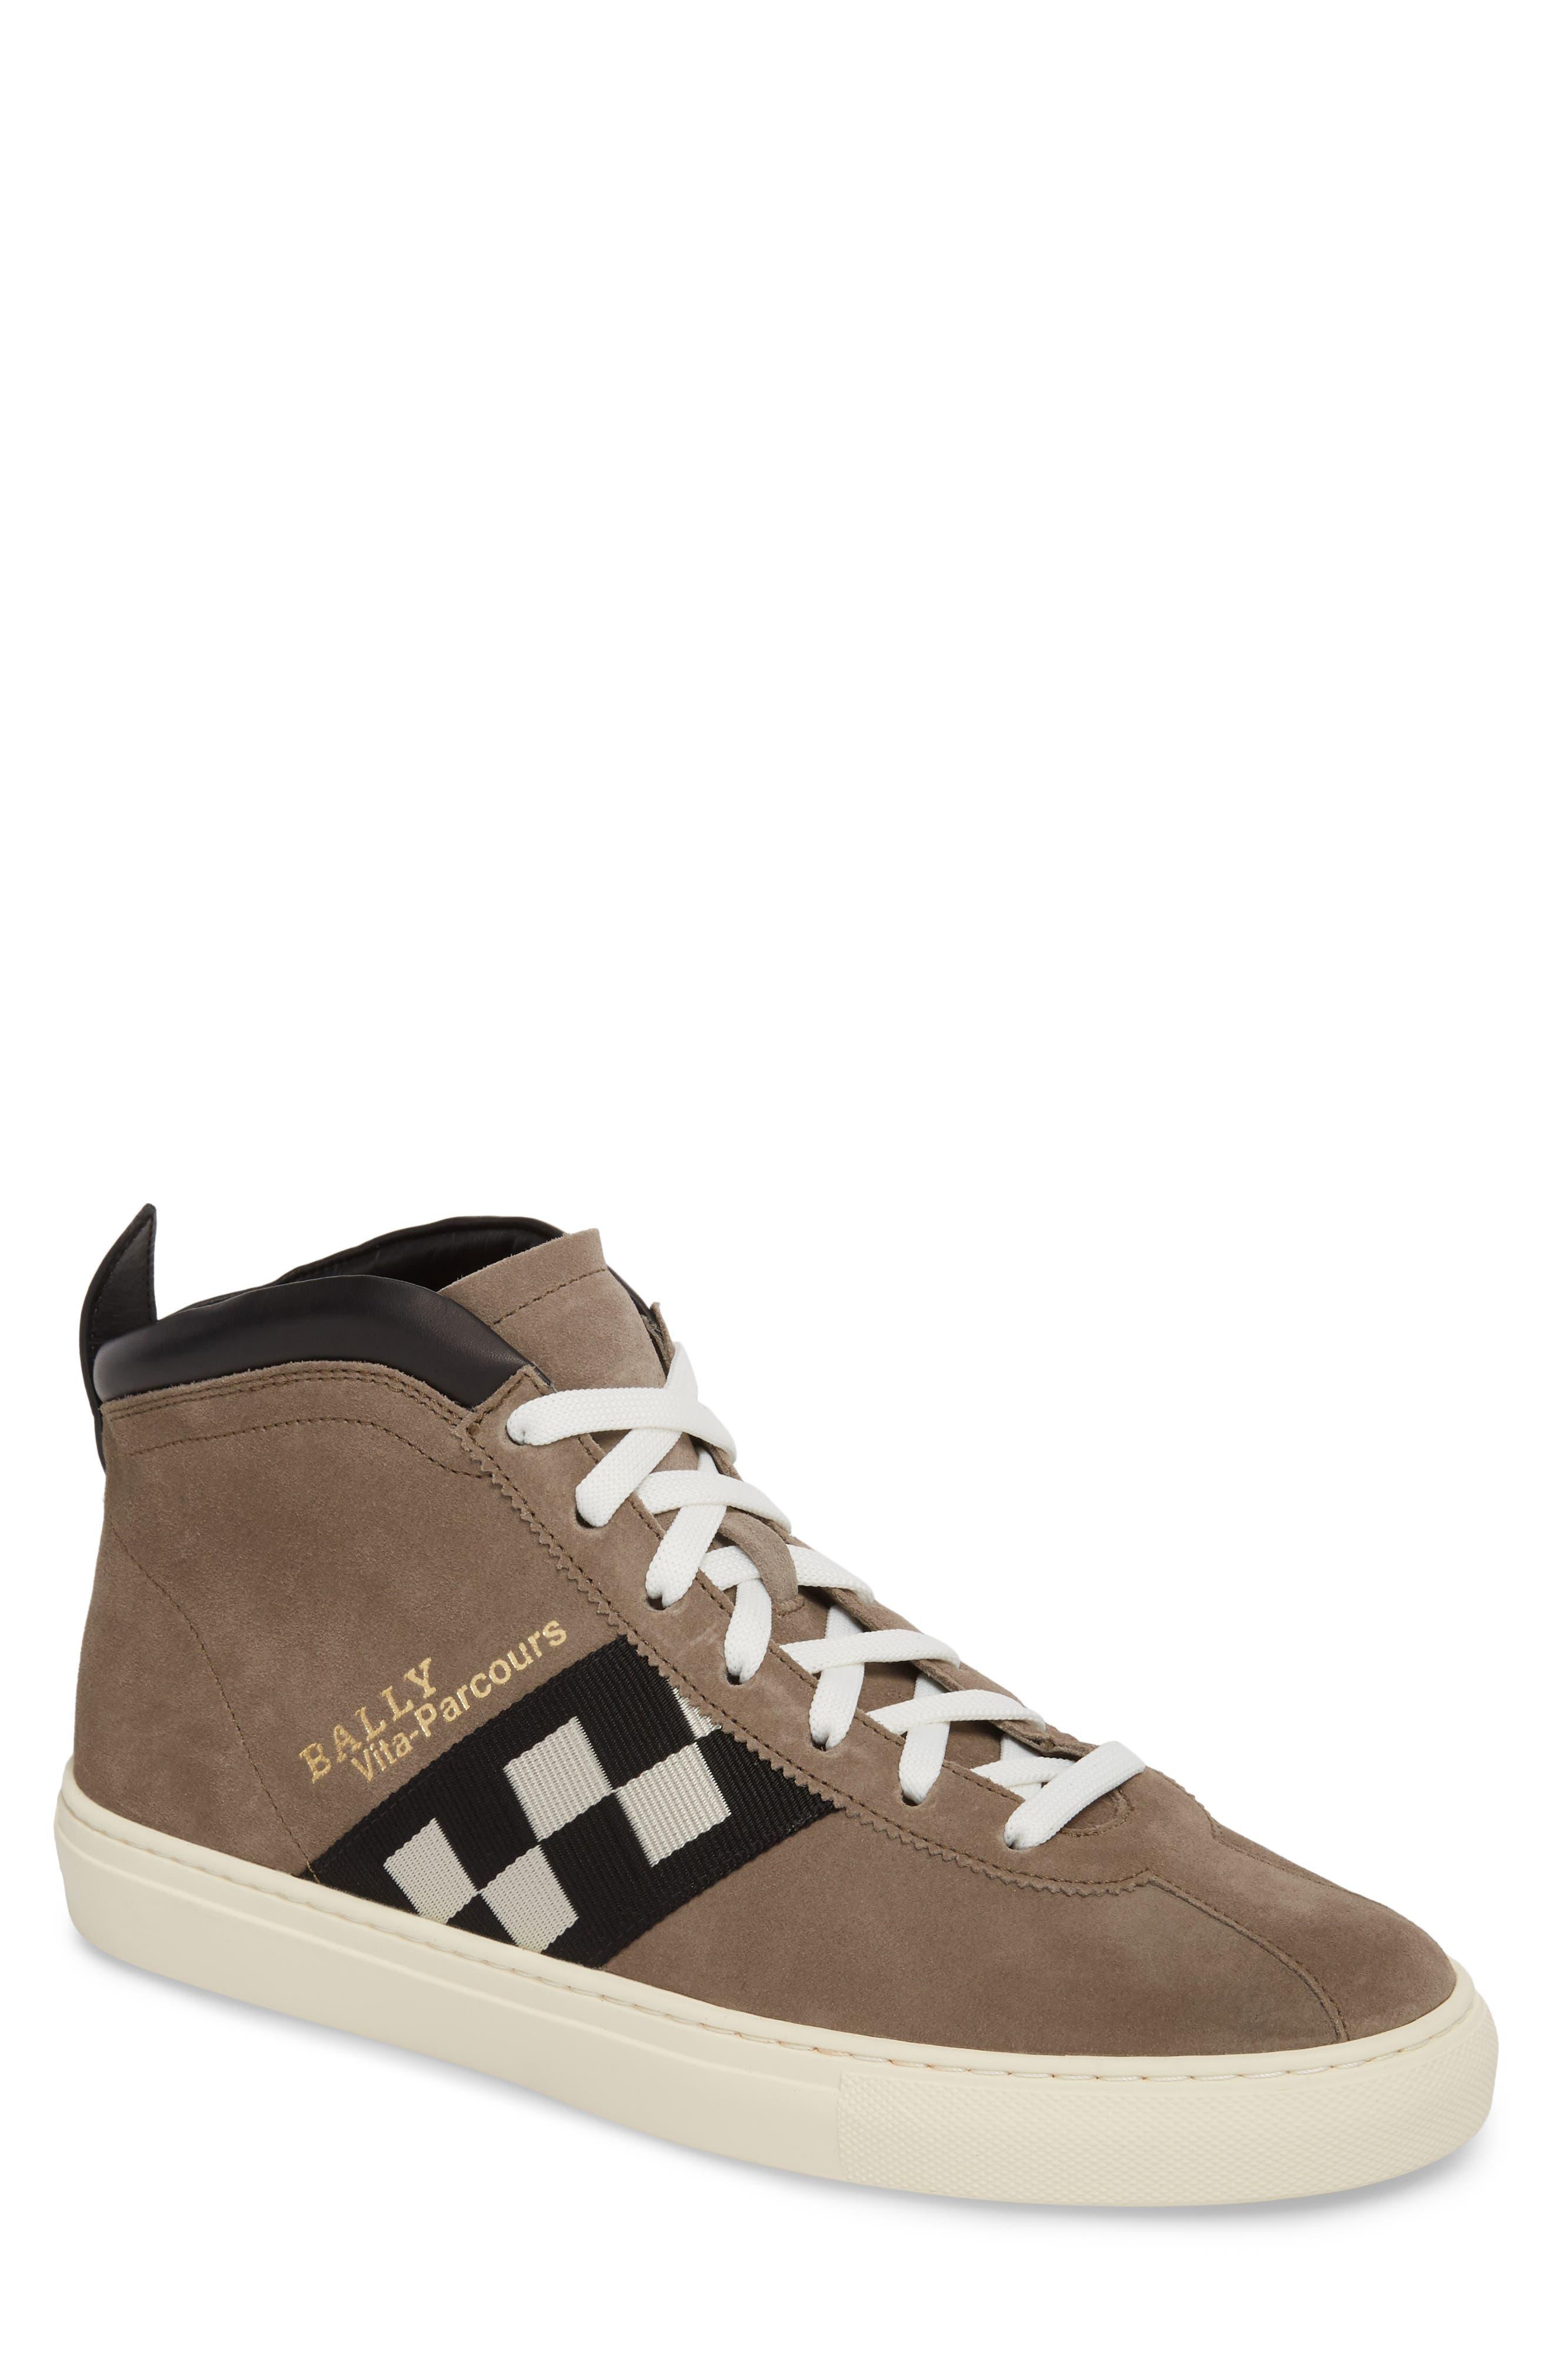 Vita Checkered High Top Sneaker,                             Main thumbnail 1, color,                             Snuff